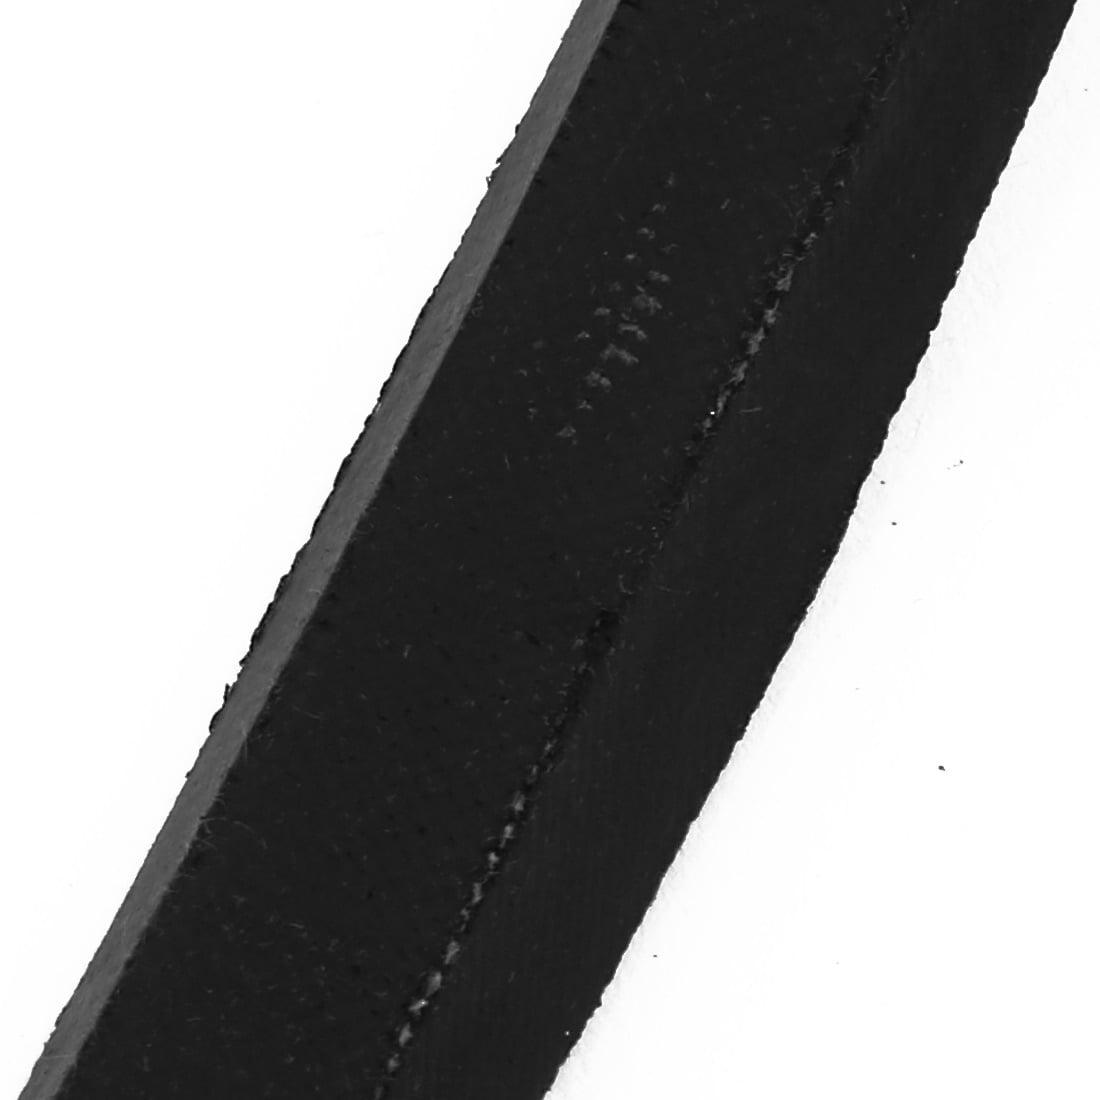 Unique Bargains B830 17mm Width 11mm Thickness Rubber Transmission Drive V-Belt - image 1 de 3